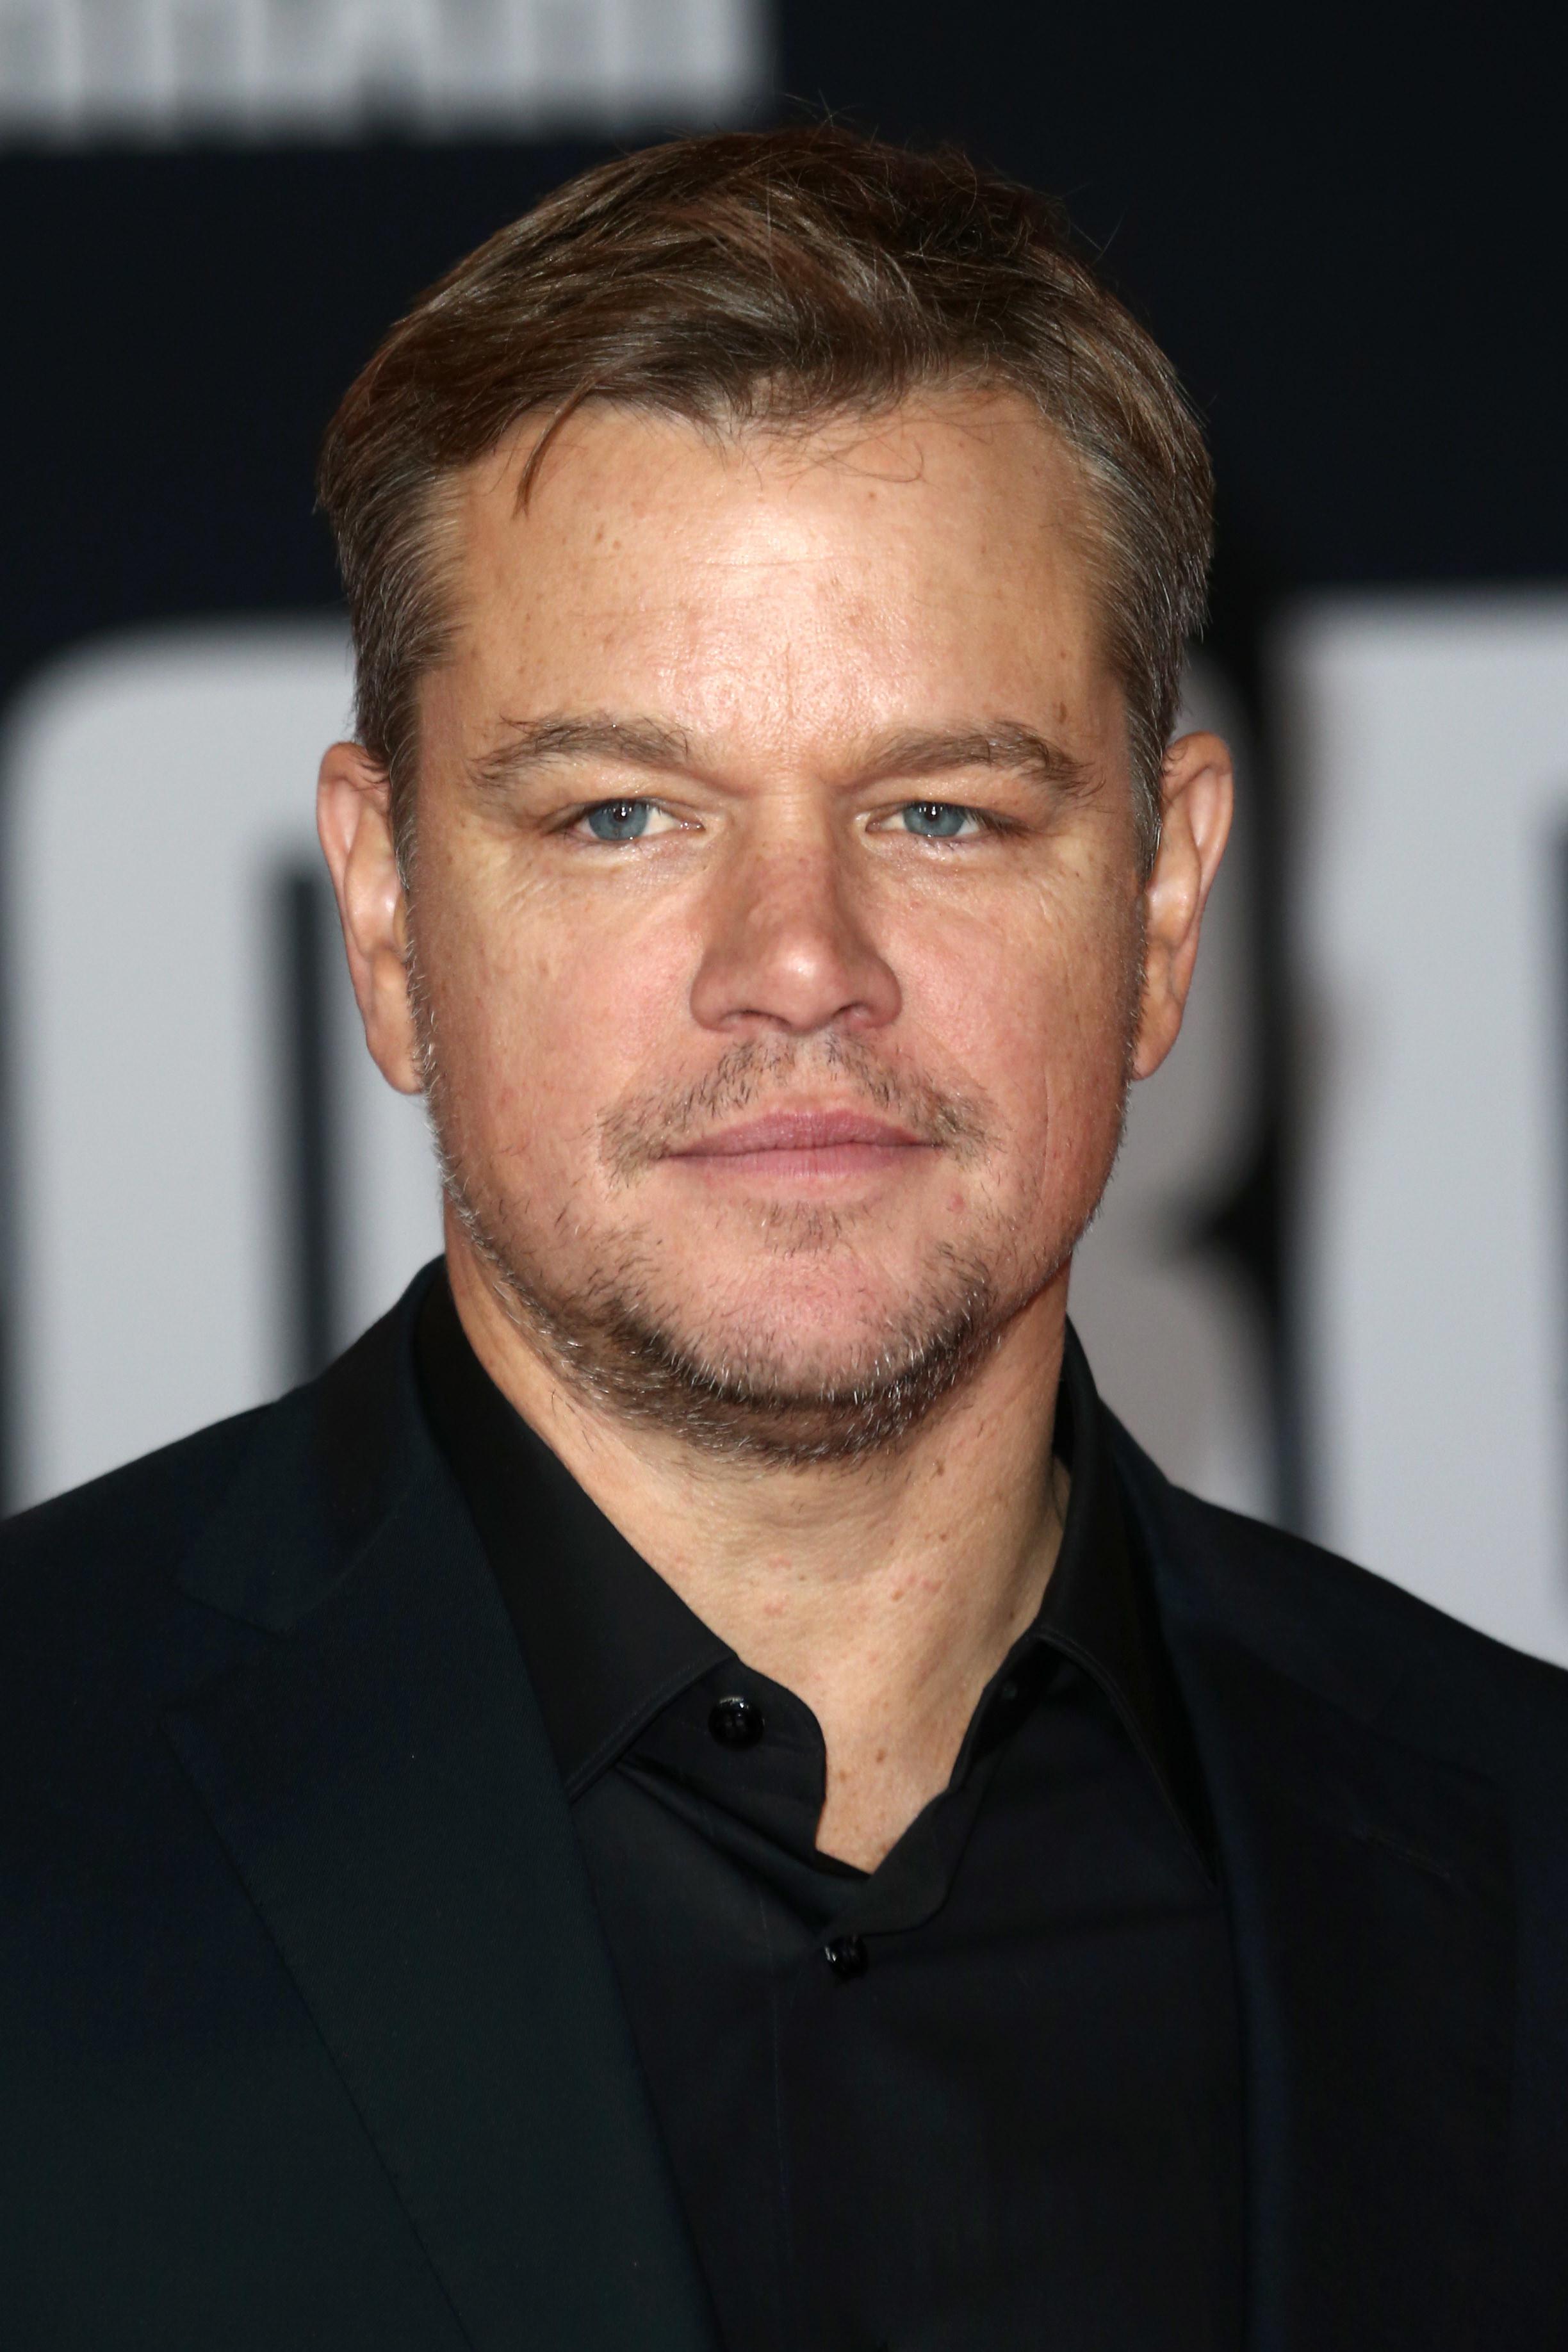 Damon at a movie premiere